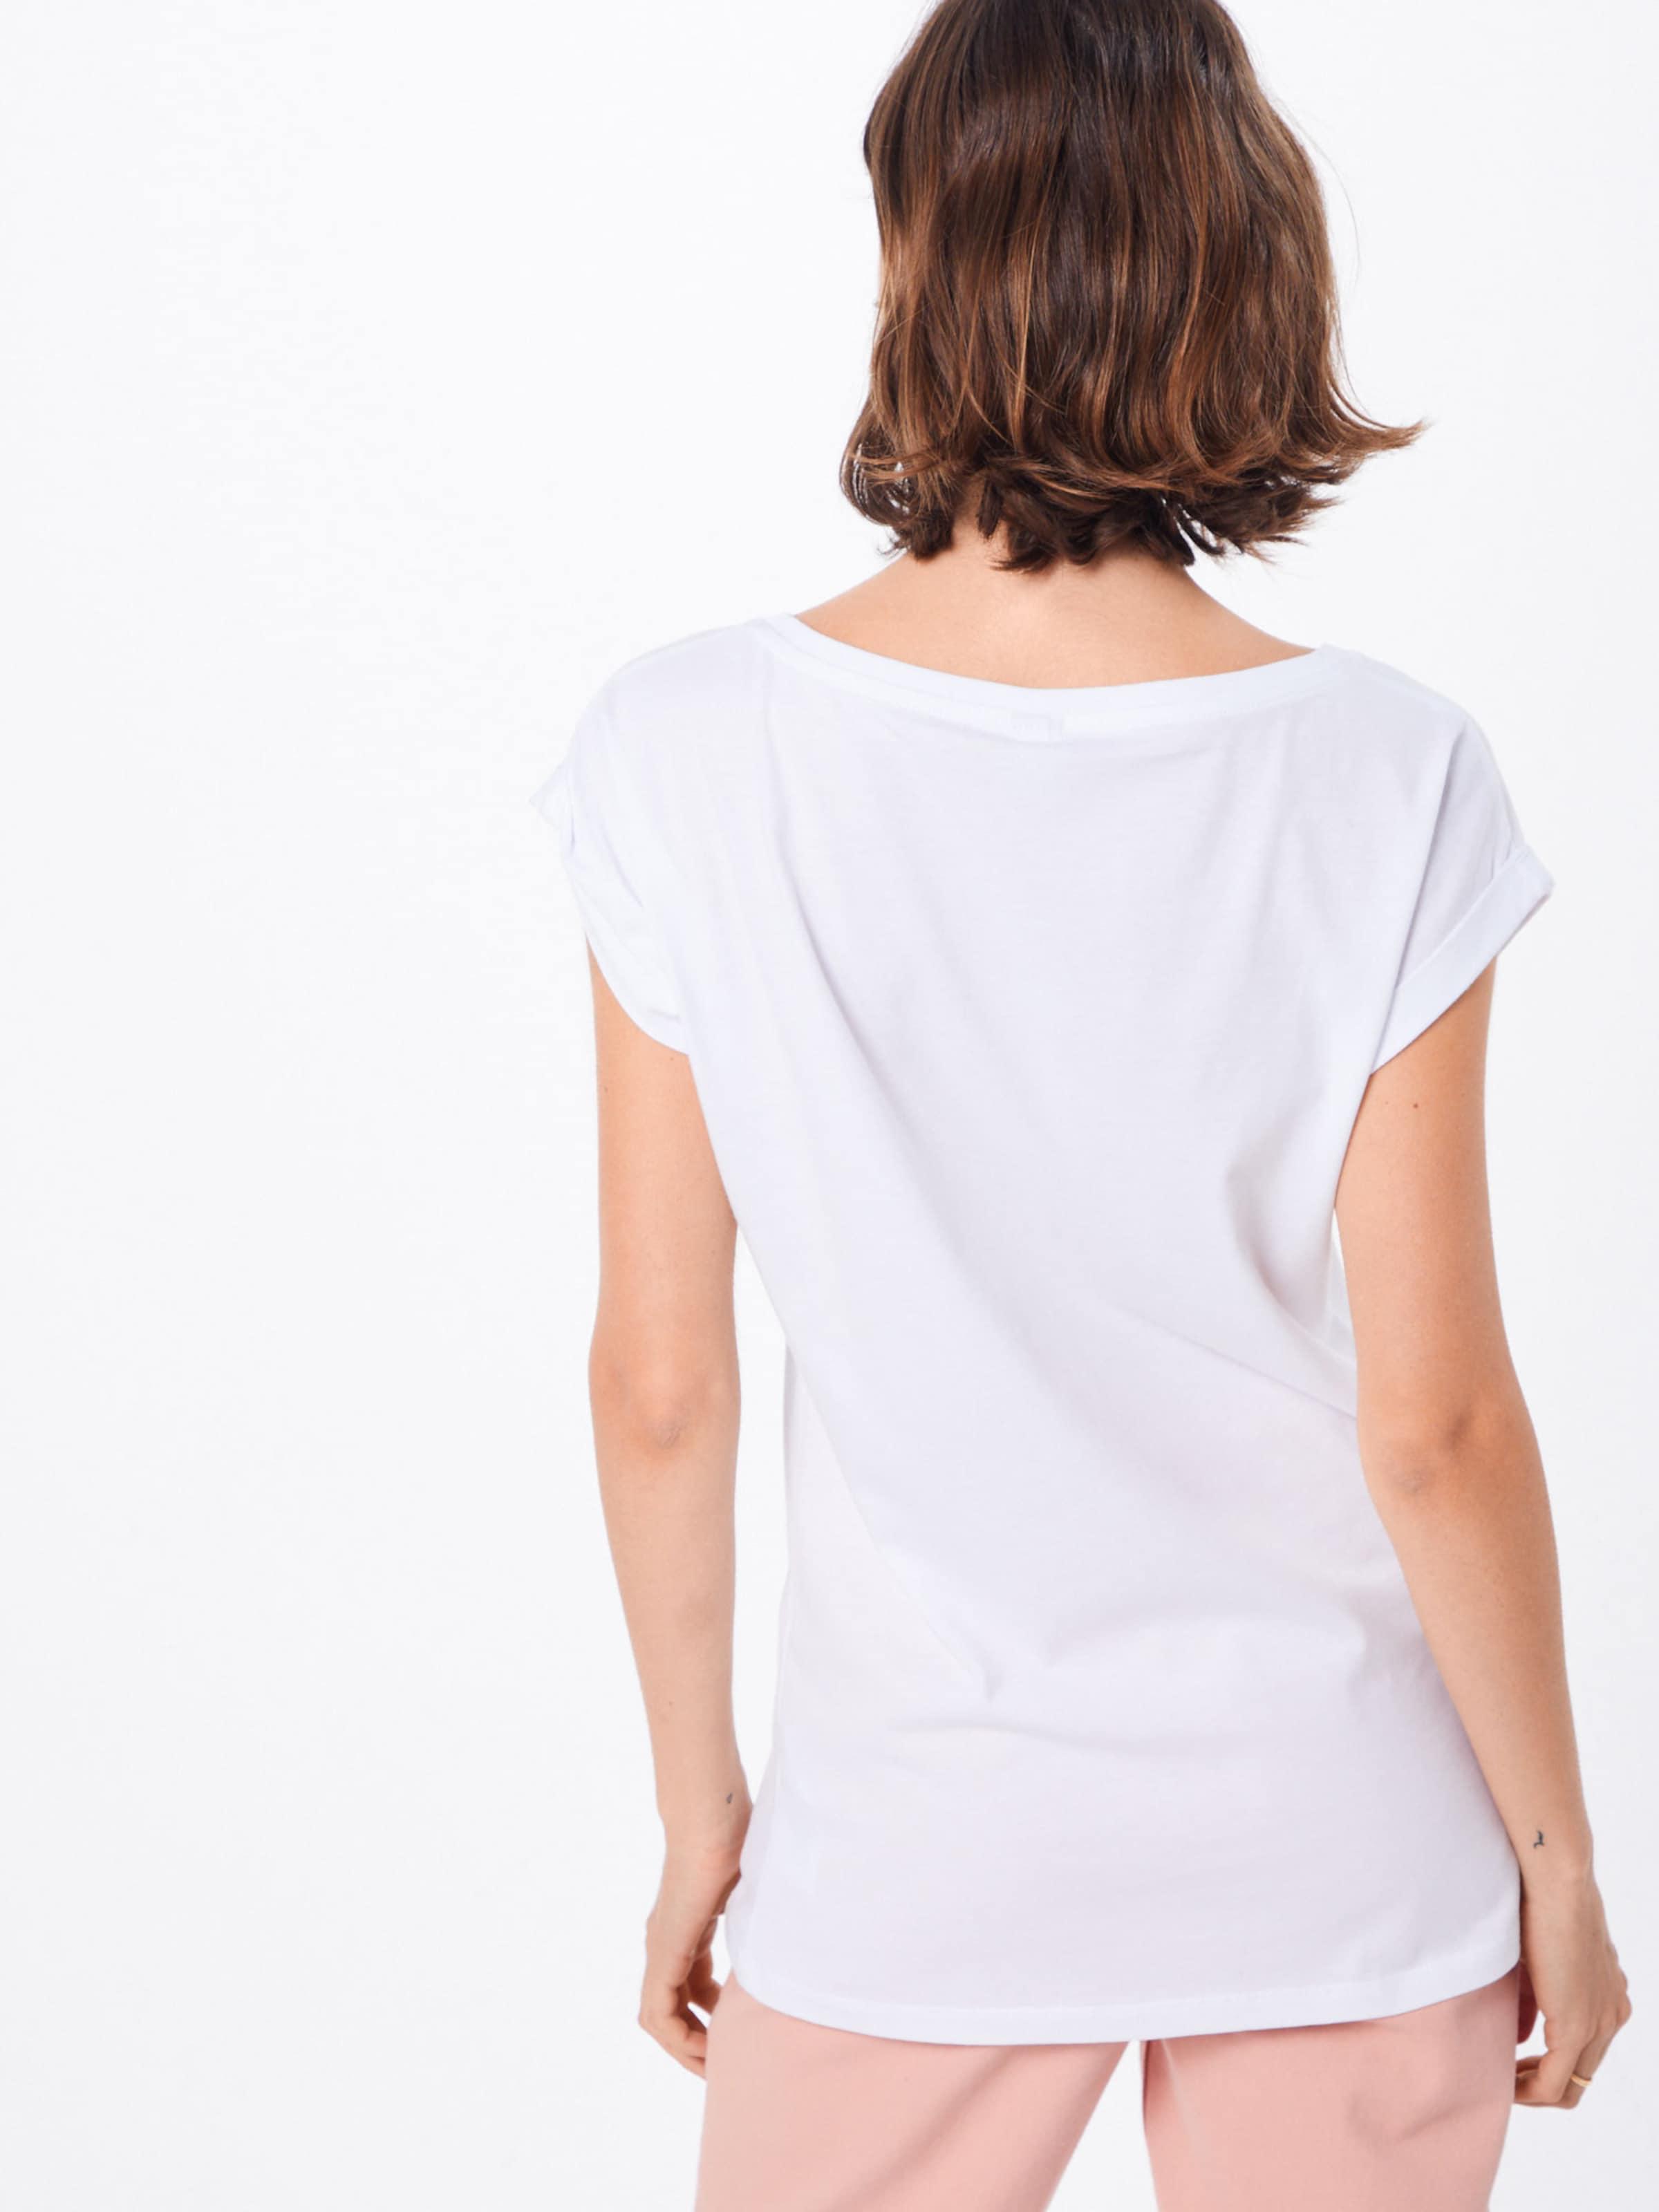 Fauny' shirt En T Pétrole 'all Iriedaily EHWDYe2I9